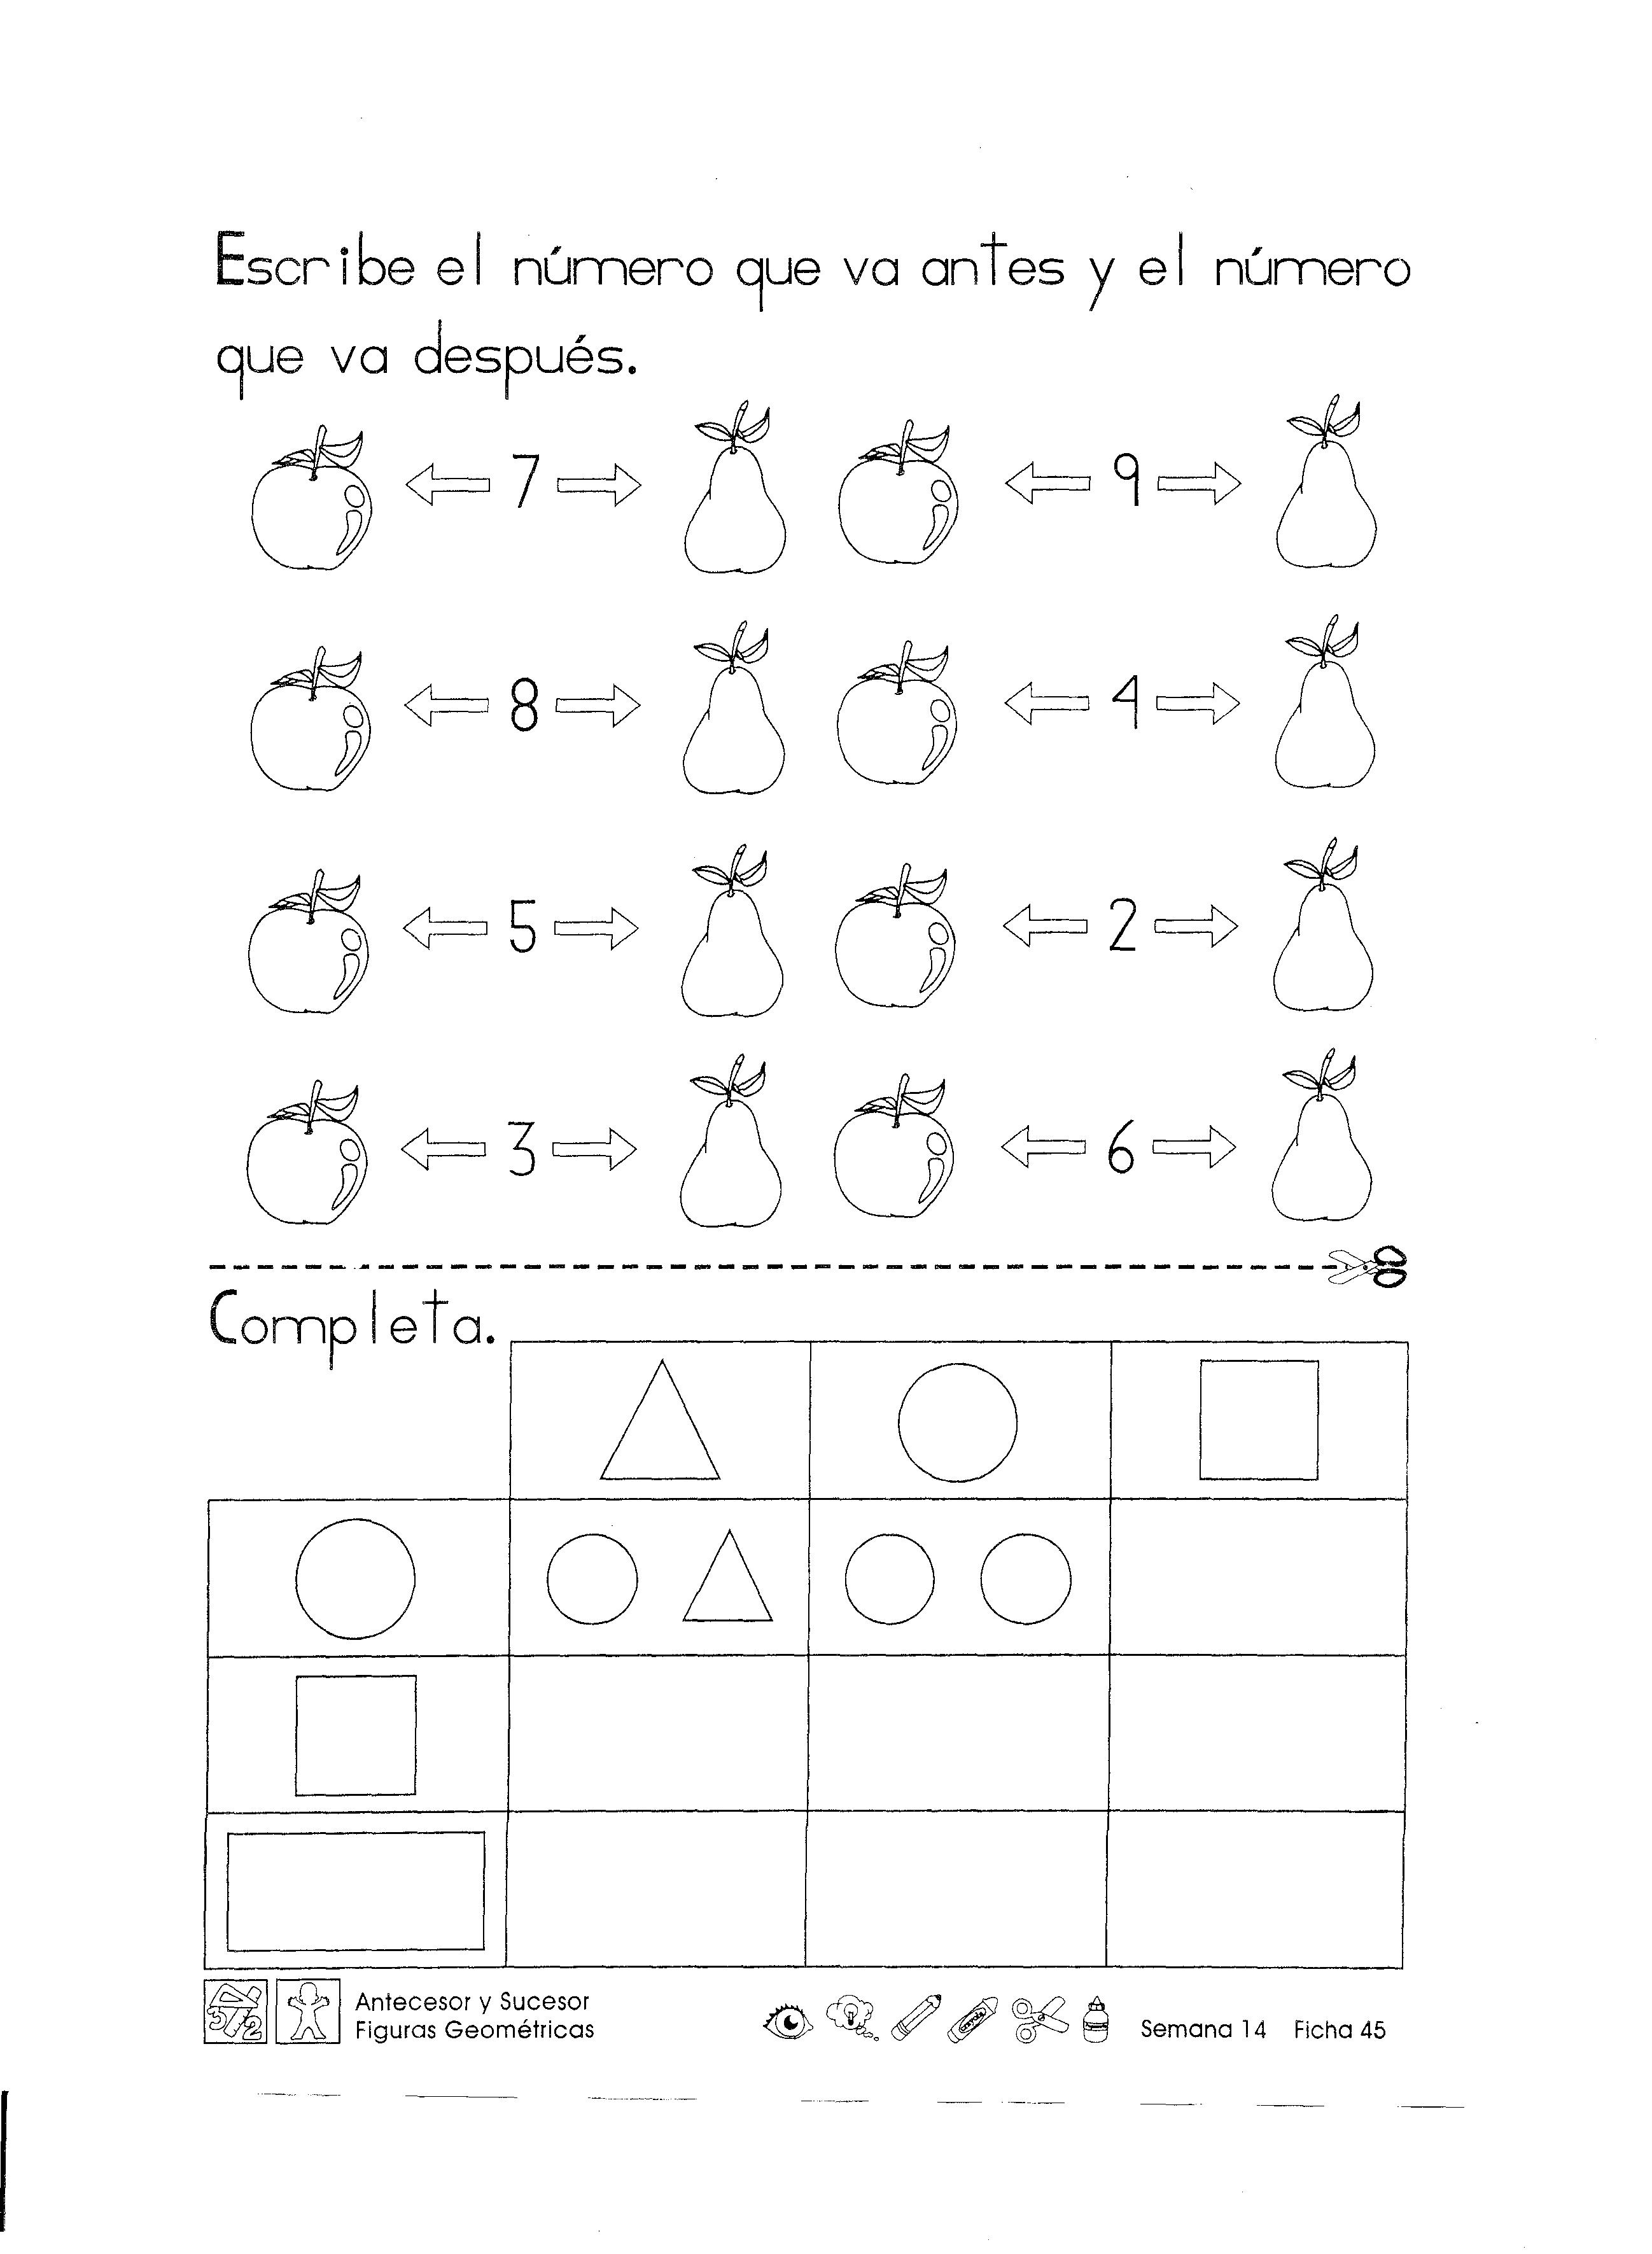 Antecesor Y Sucesor Figuras Geometricas